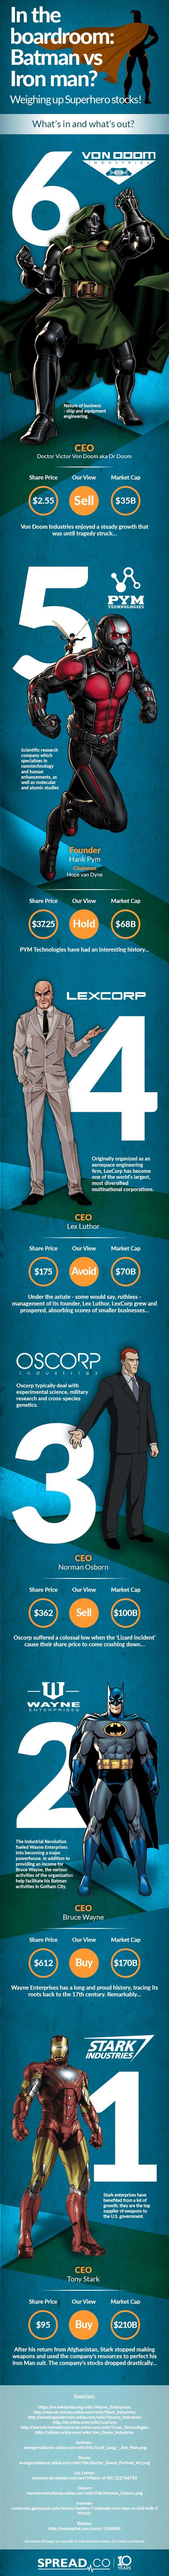 infographie entreprises Superhero marvel dc